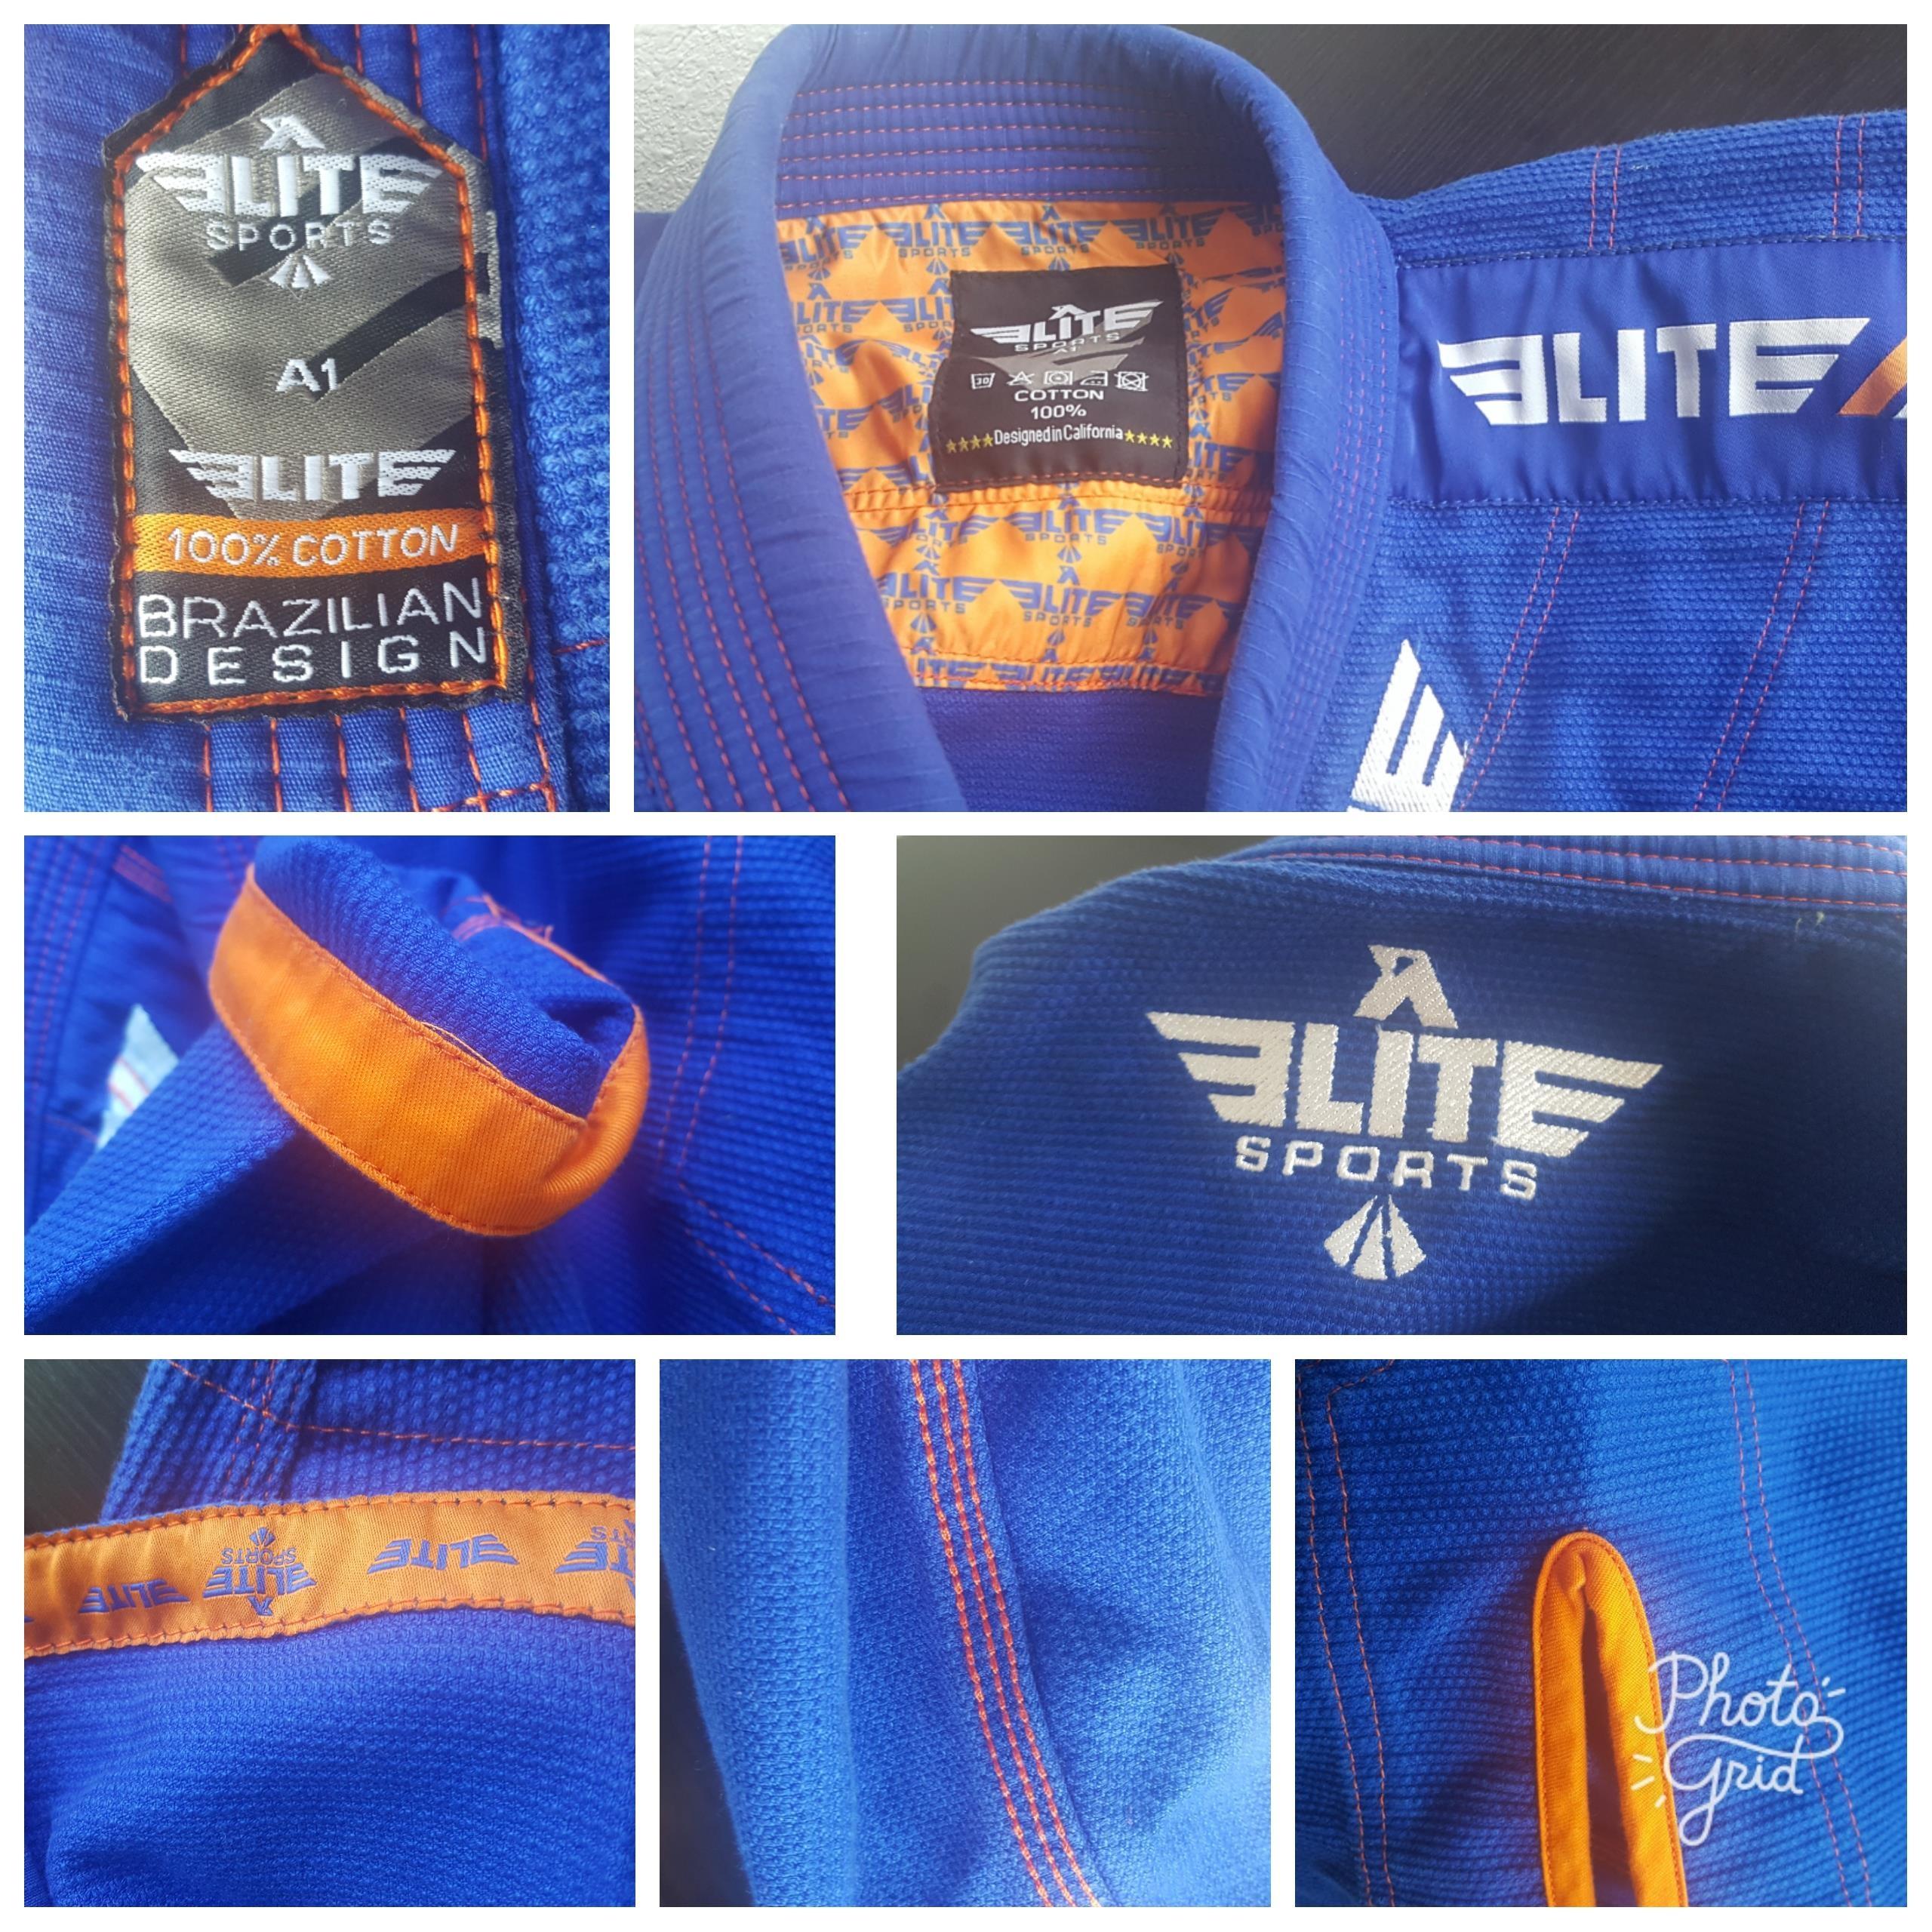 Elite Sports Ultra-Light BJJ Jiu Jitsu Gi with Pre-Shrunk Fabric – Blue